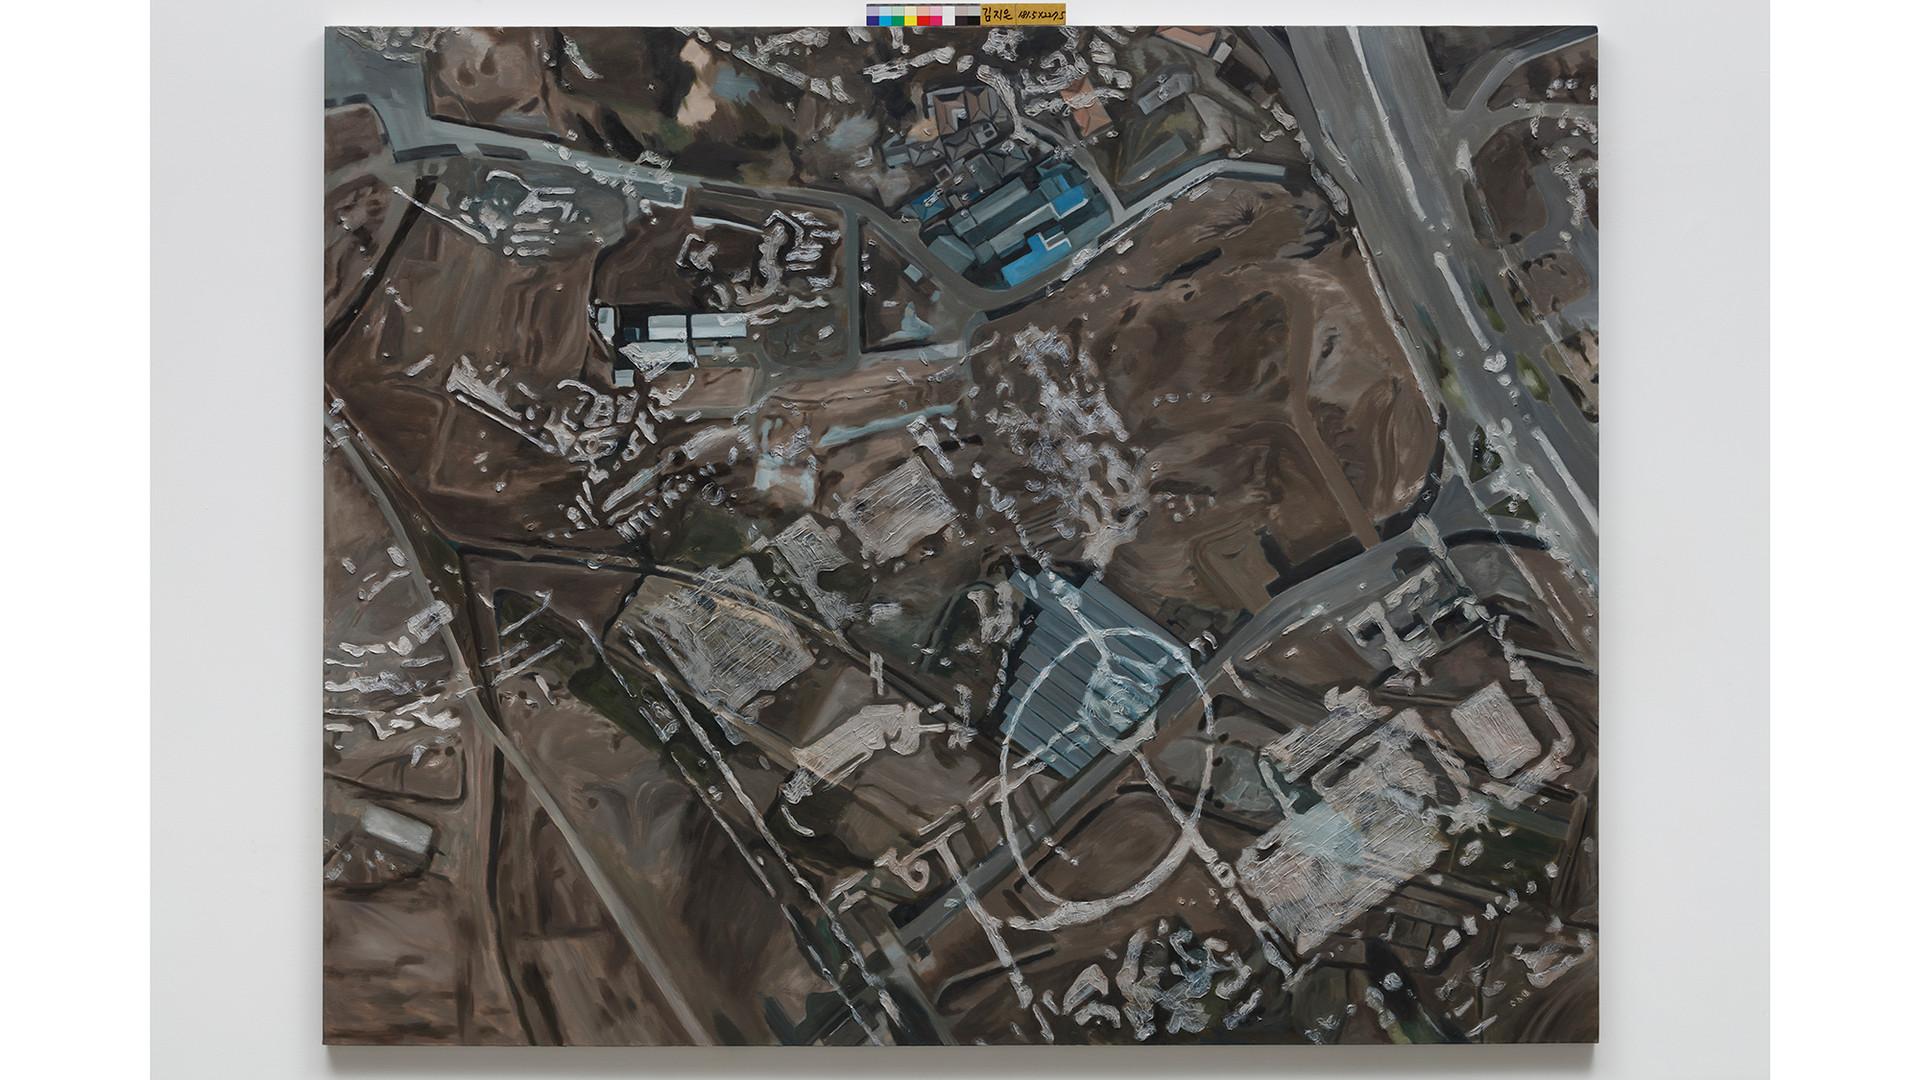 Memories of Land 땅이 기억하는 이야기, 2016, oil on canvas, 181.8x227.3cm